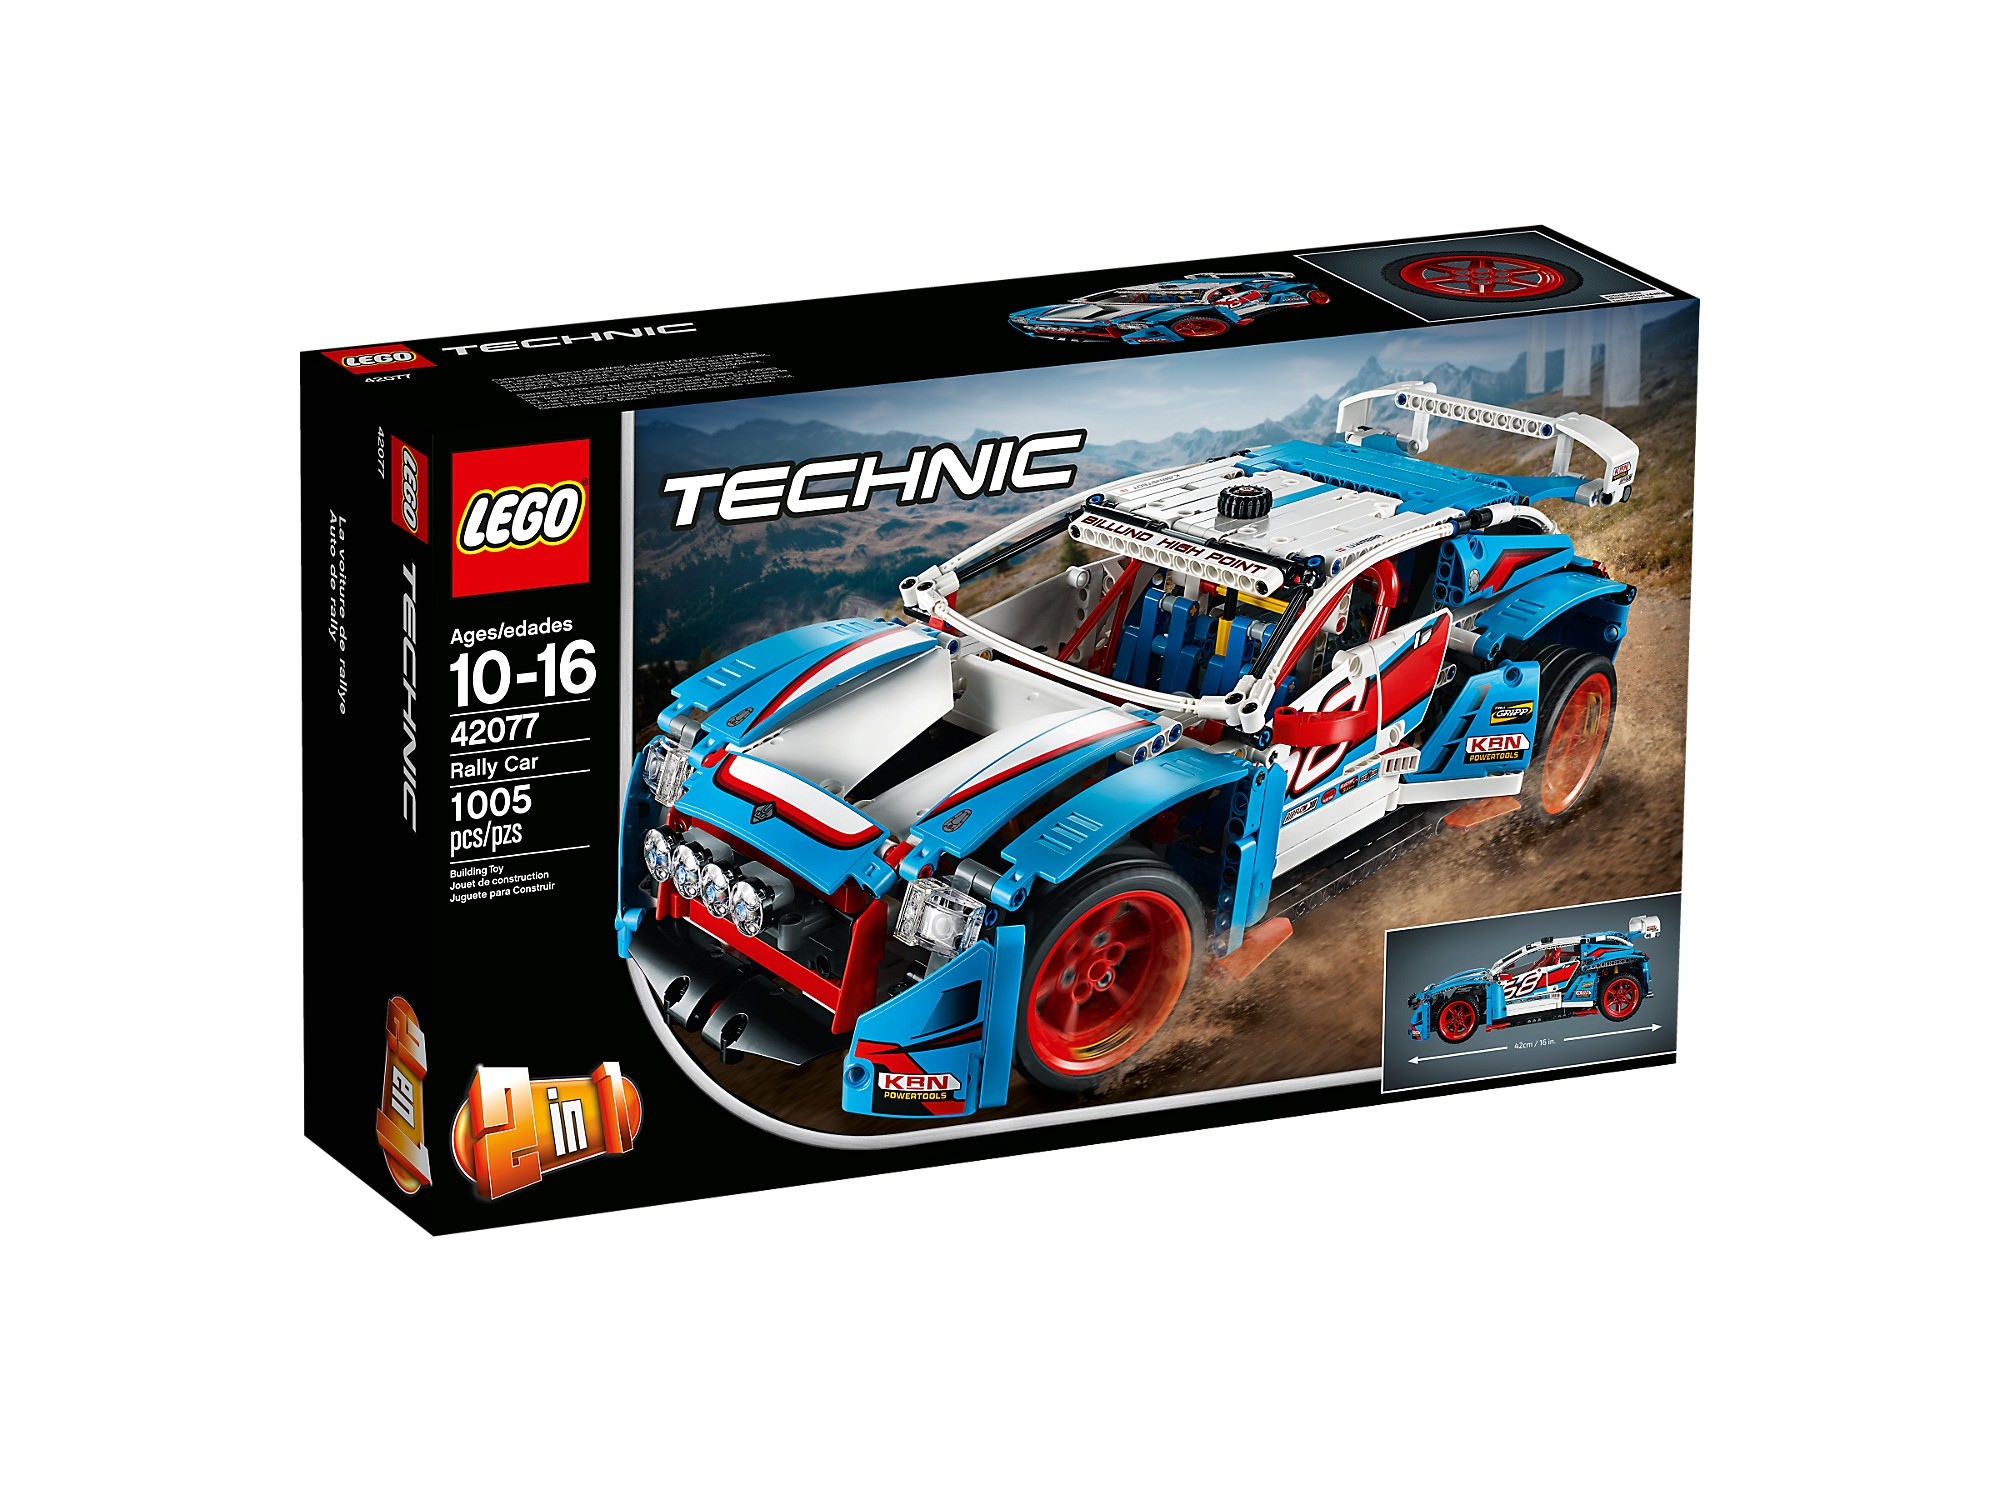 LEGO 42077 La voiture de rallye